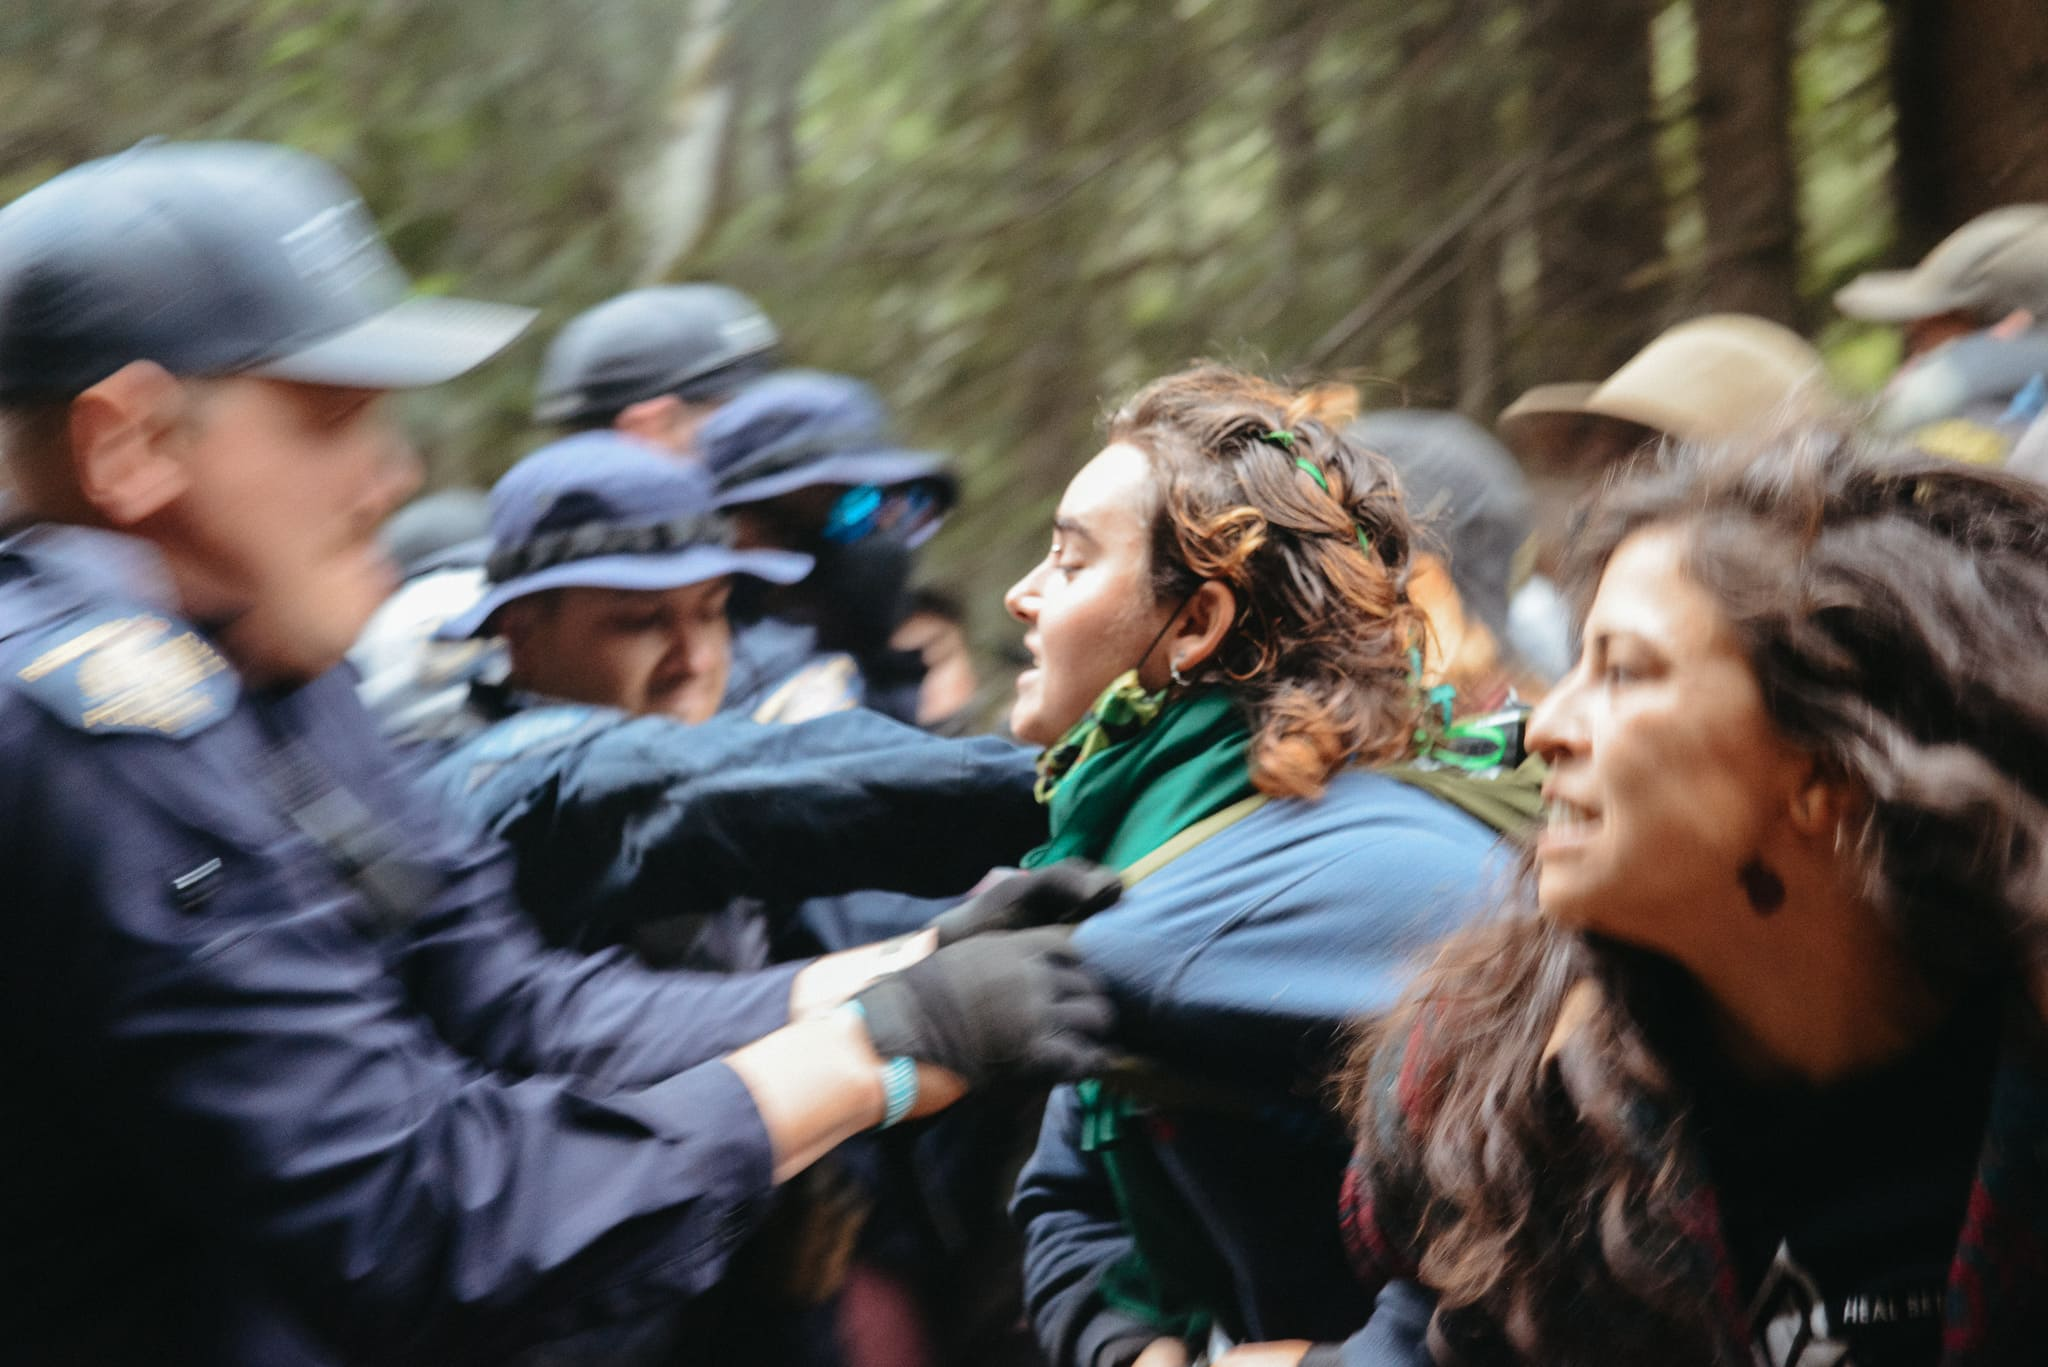 scuffles between RCMP and protestors at the Fairy Creek blockades